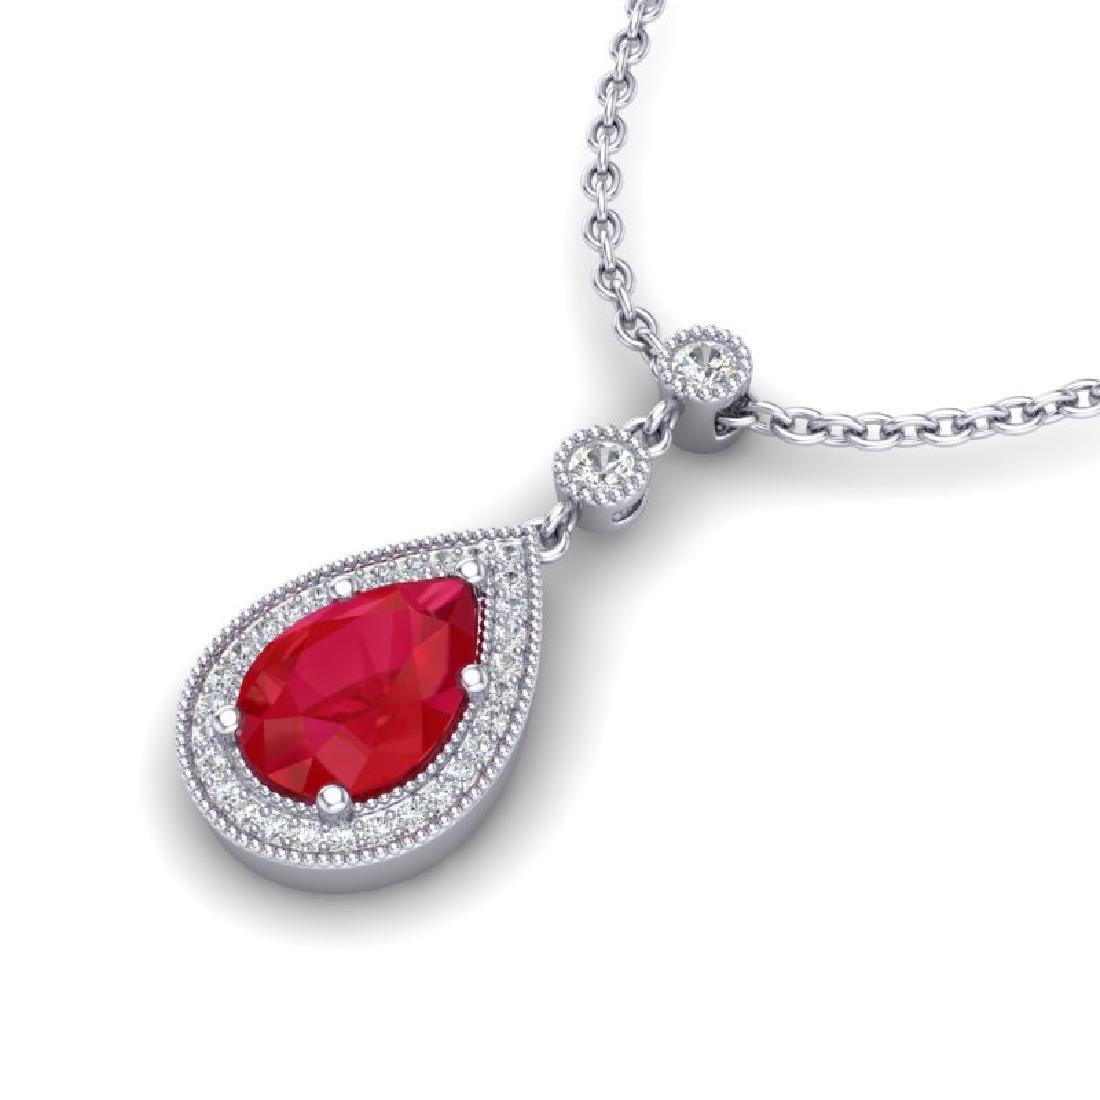 2.75 CTW Ruby & Micro Pave VS/SI Diamond Necklace